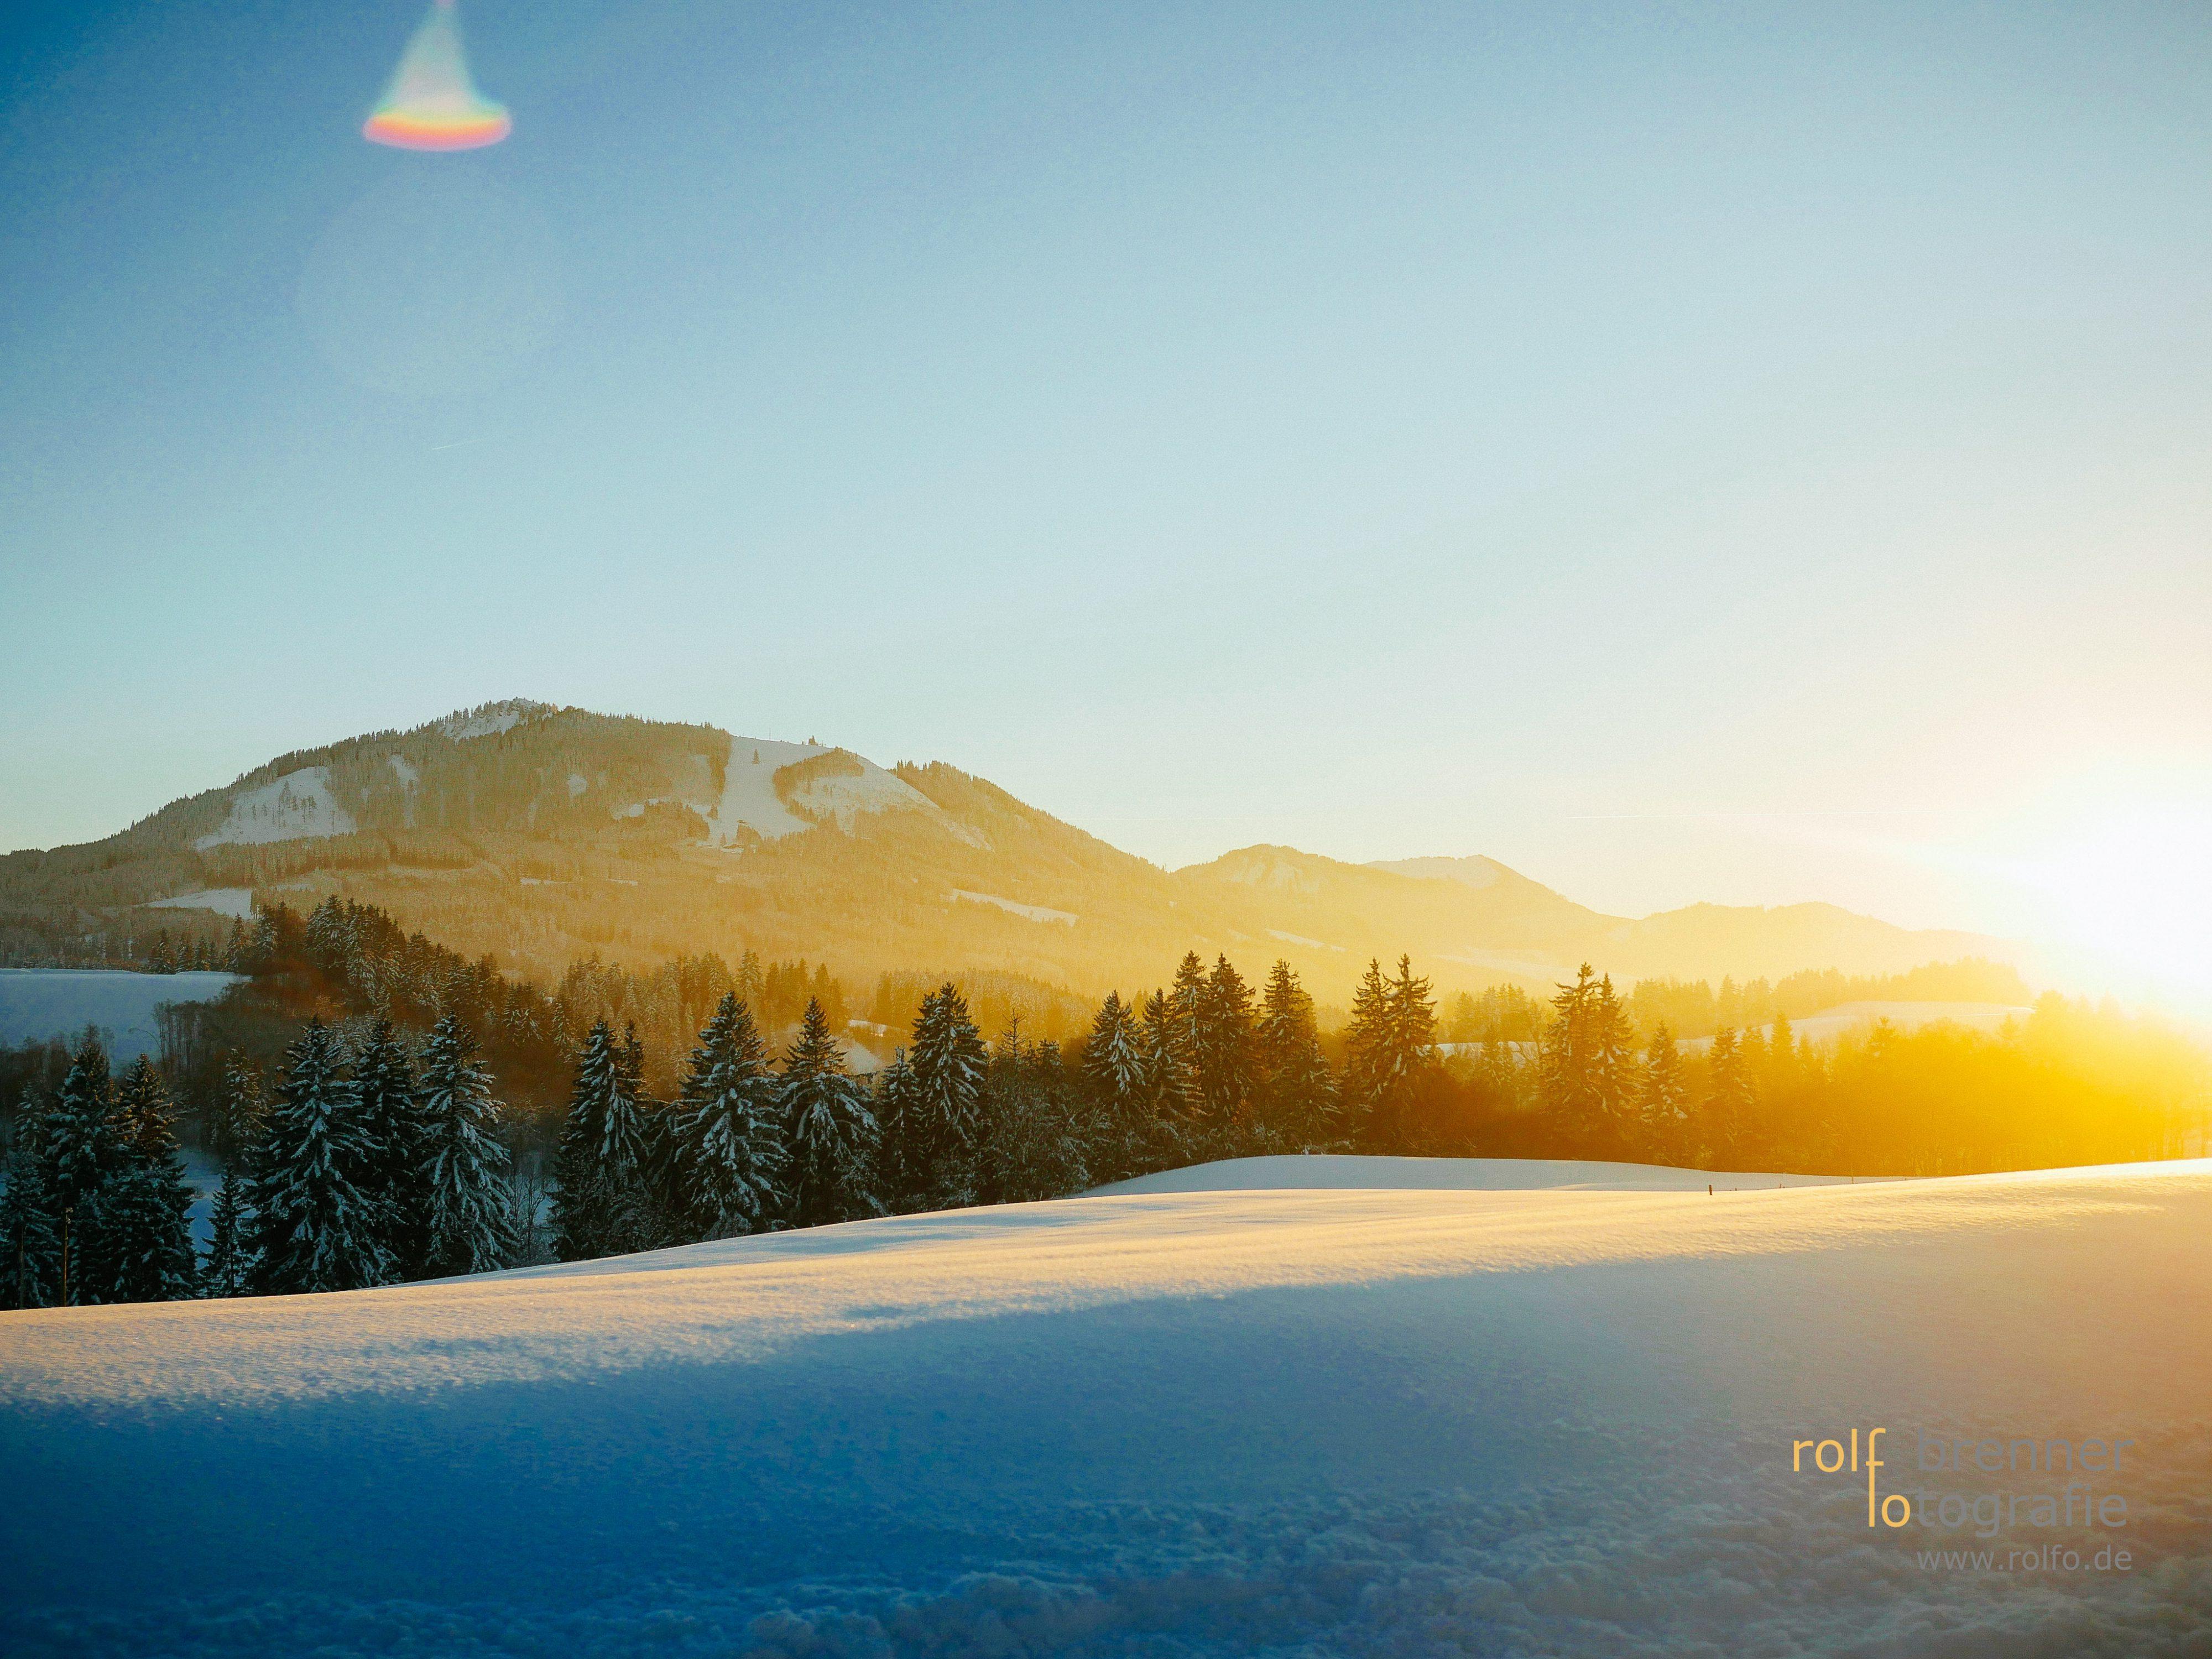 Wintersonne bei Ofterschwang